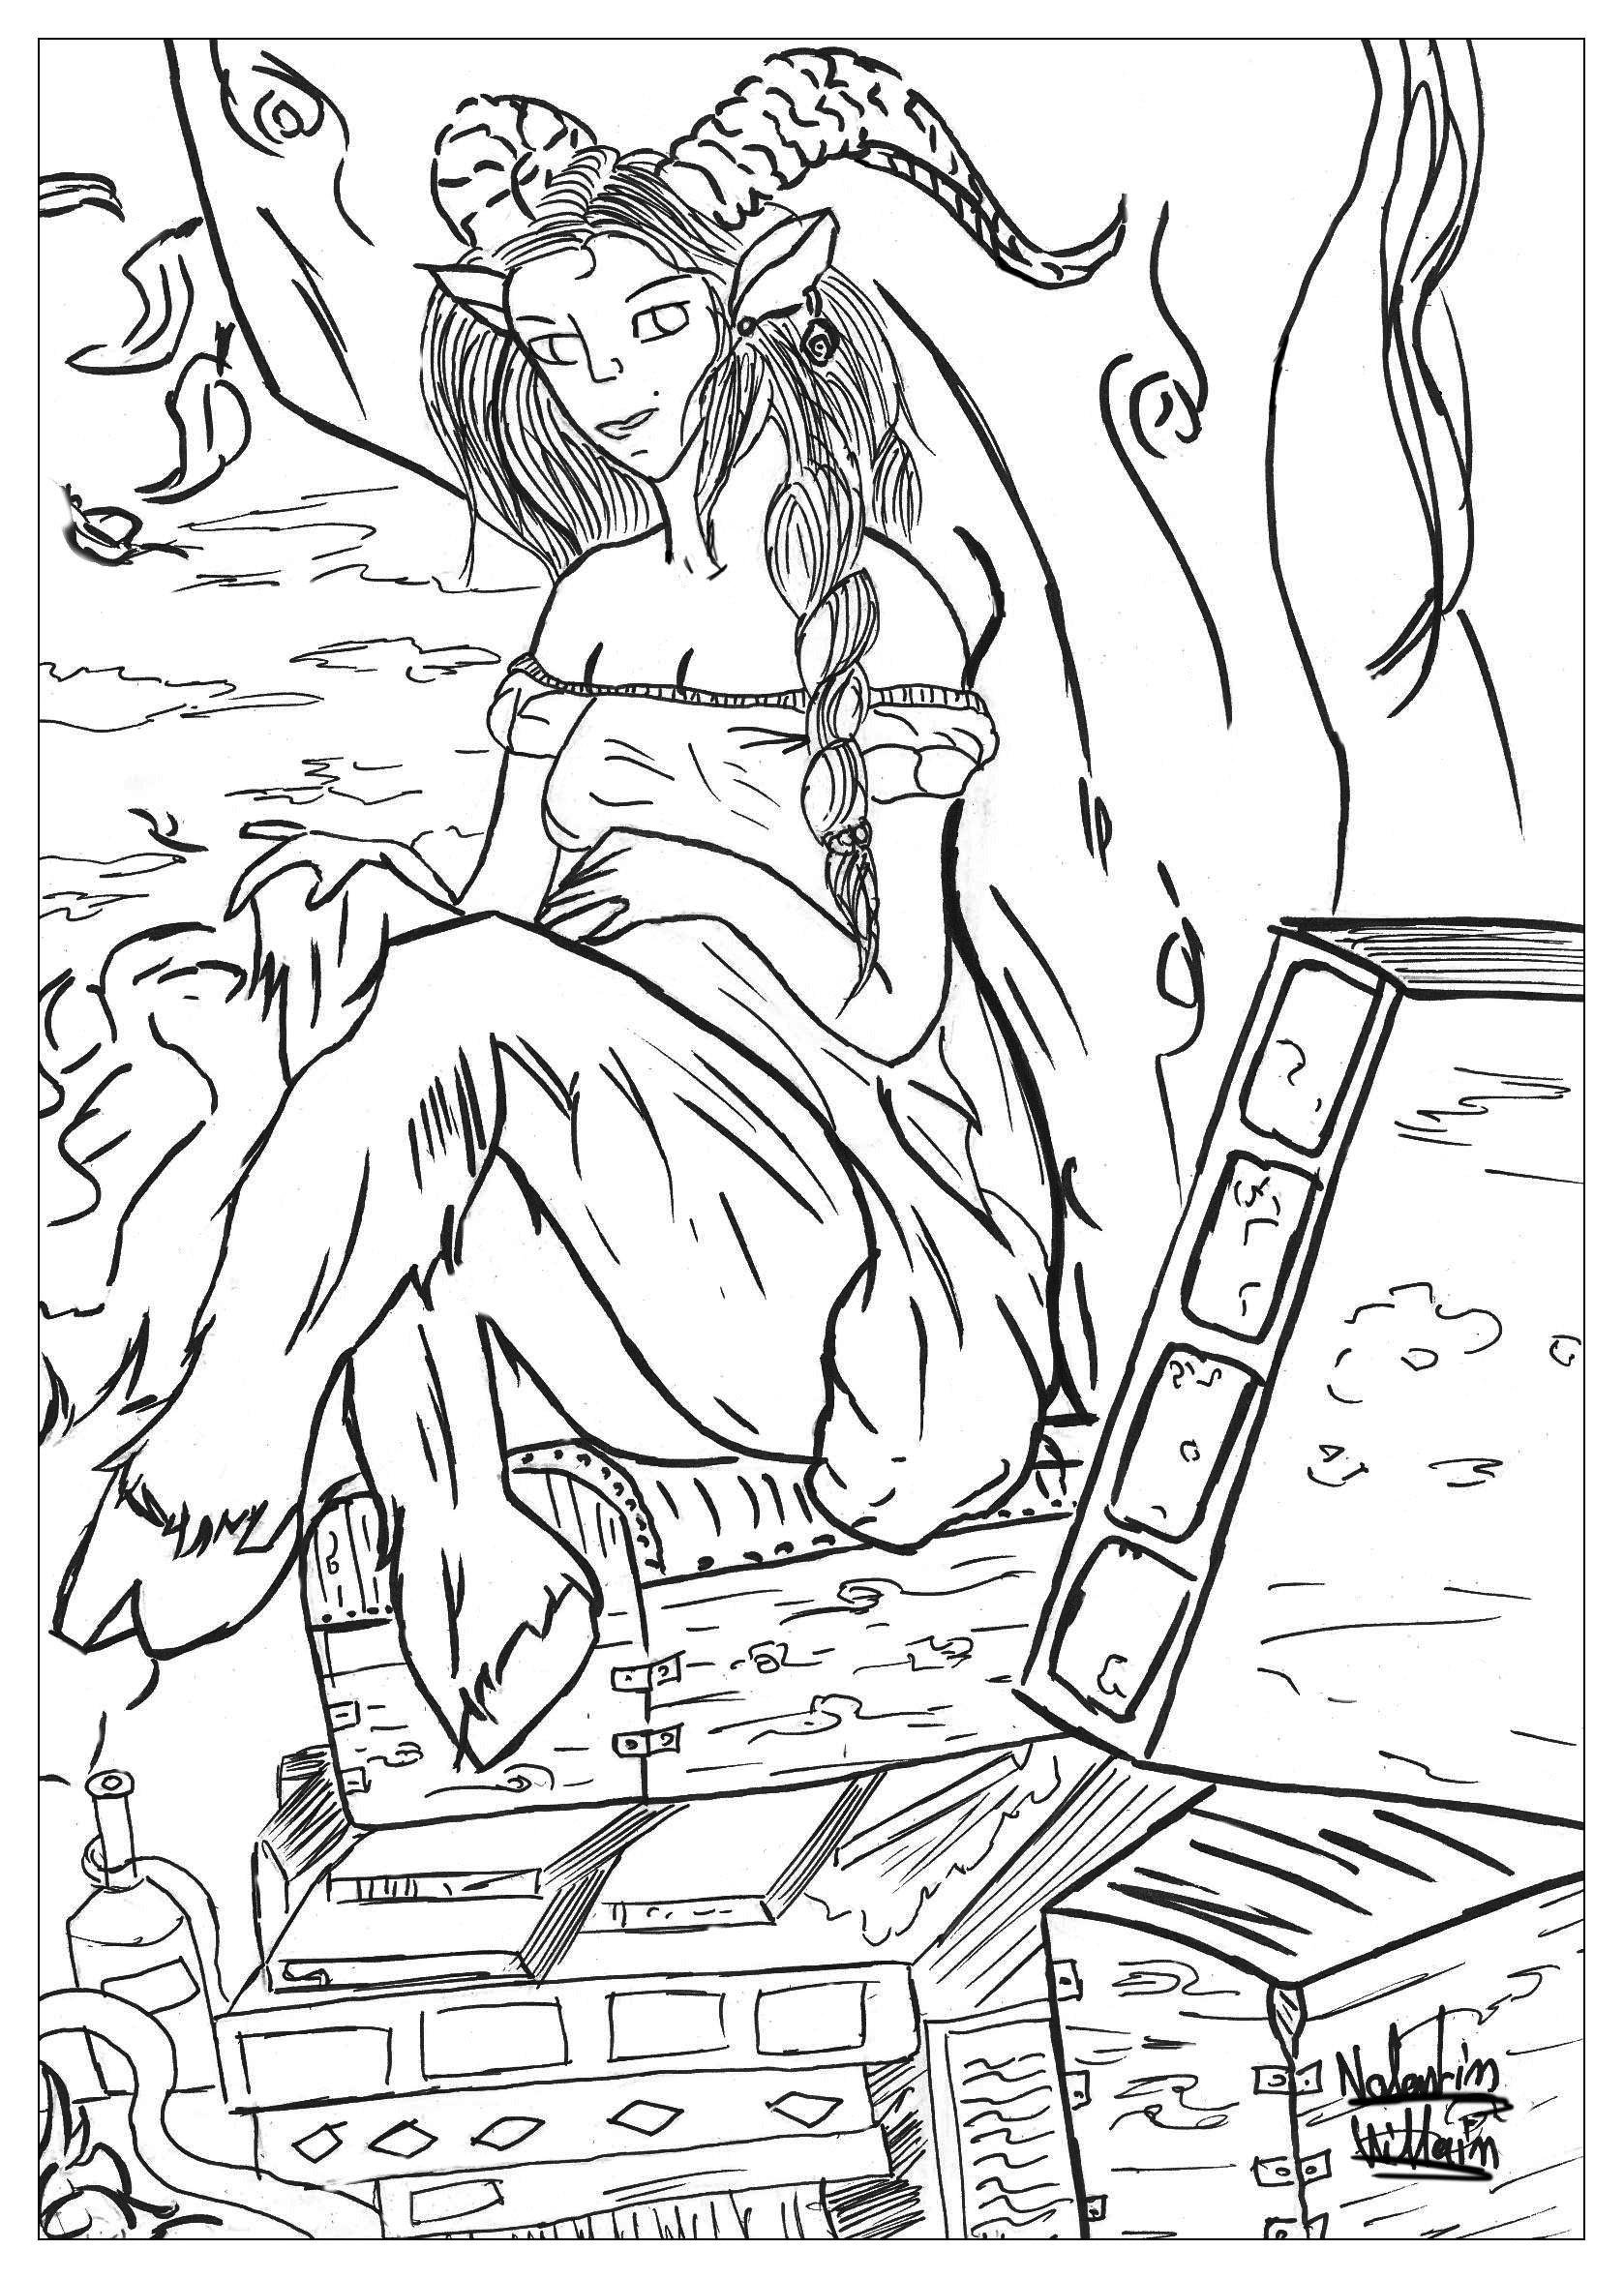 Satyr coloring #4, Download drawings